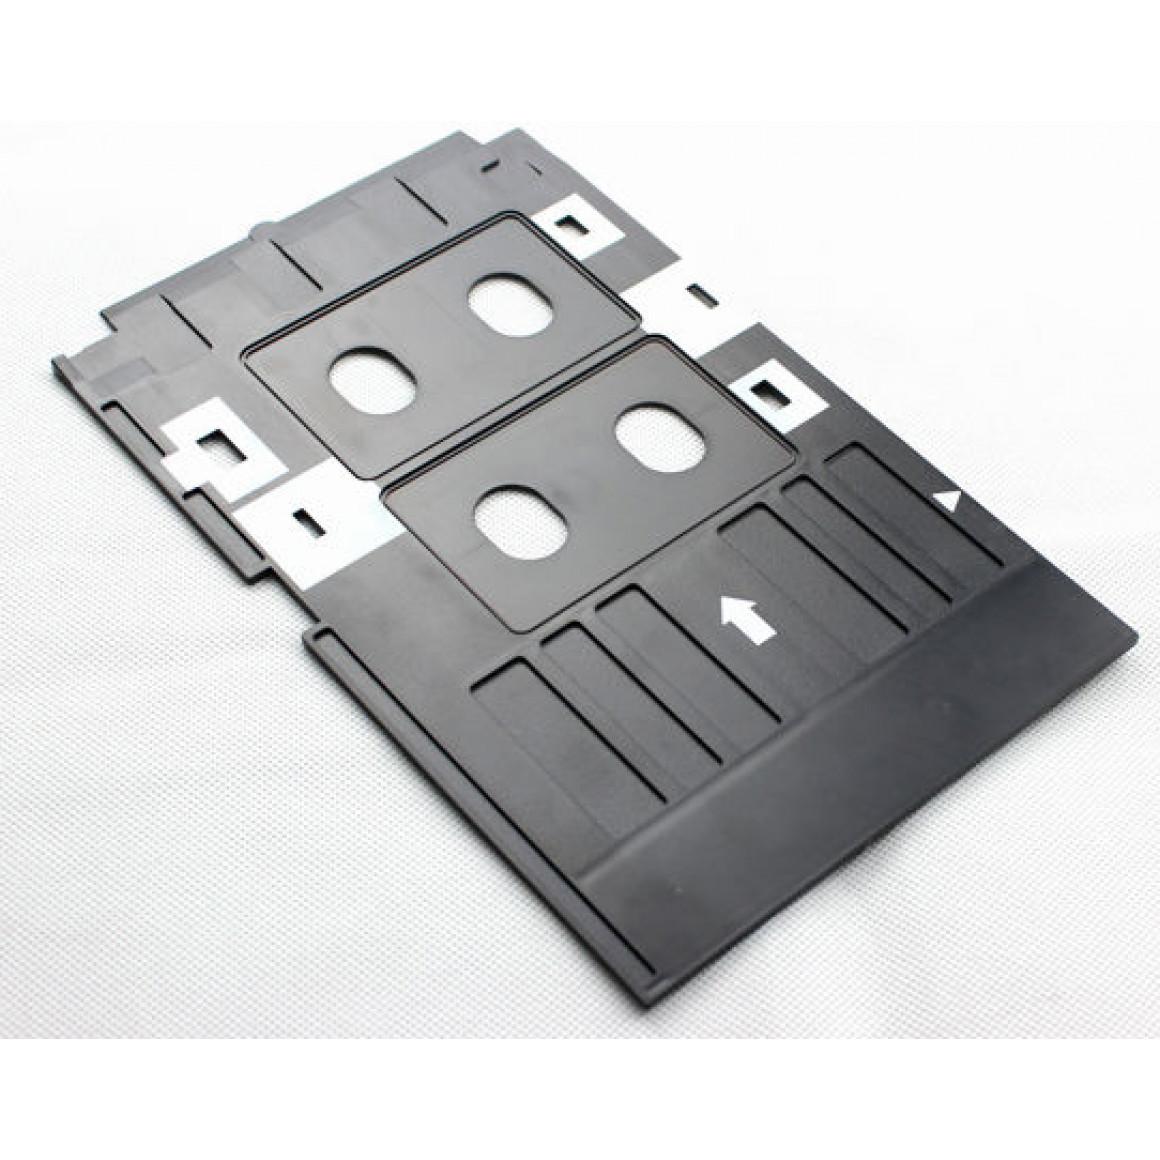 inkjet pvc card tray for epson r260 r270 r280 r290. Black Bedroom Furniture Sets. Home Design Ideas